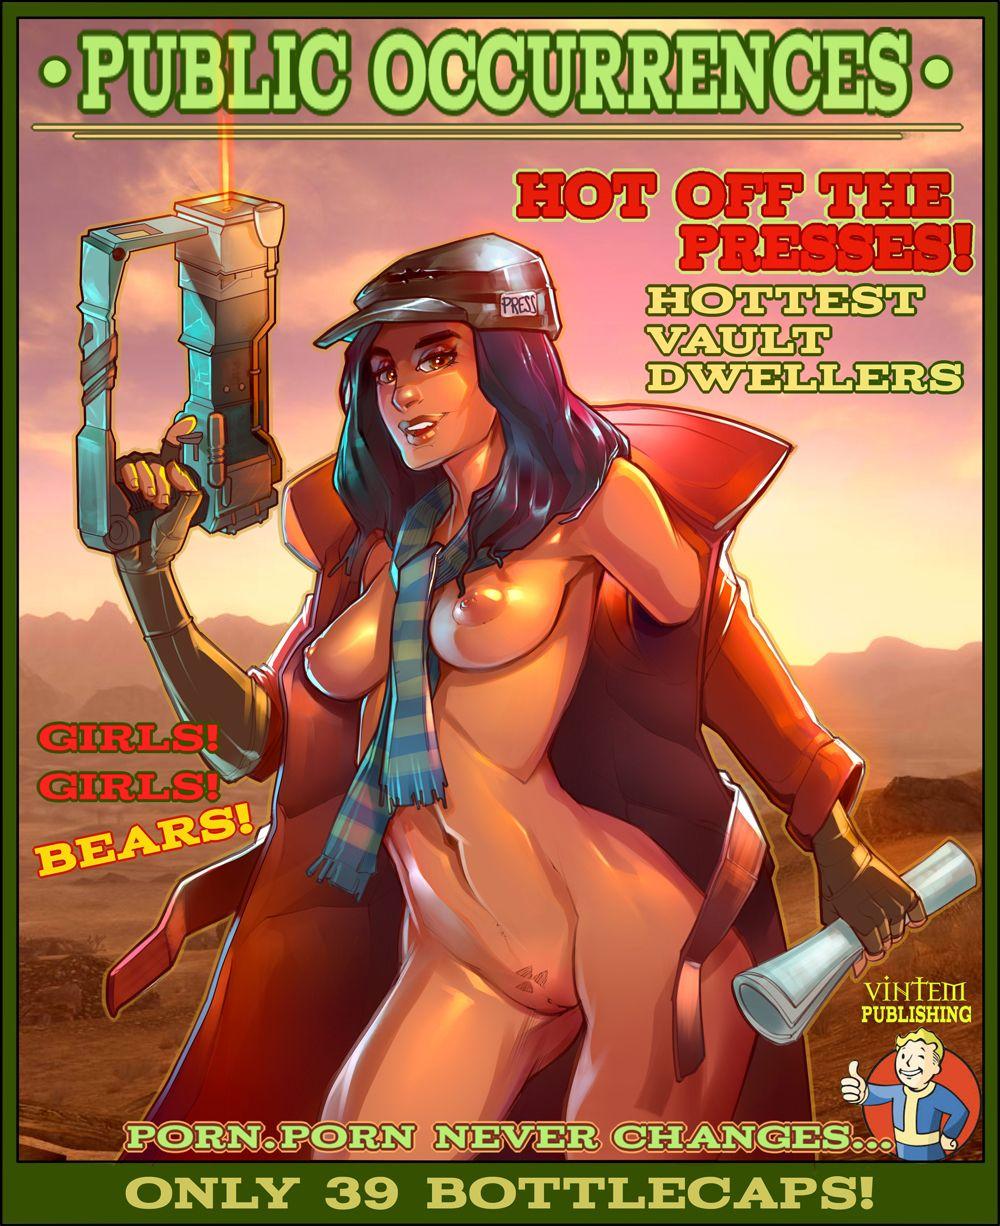 Anime Porn Comics Fallout update fantastic art piper wright fallout 4 | fallout fan